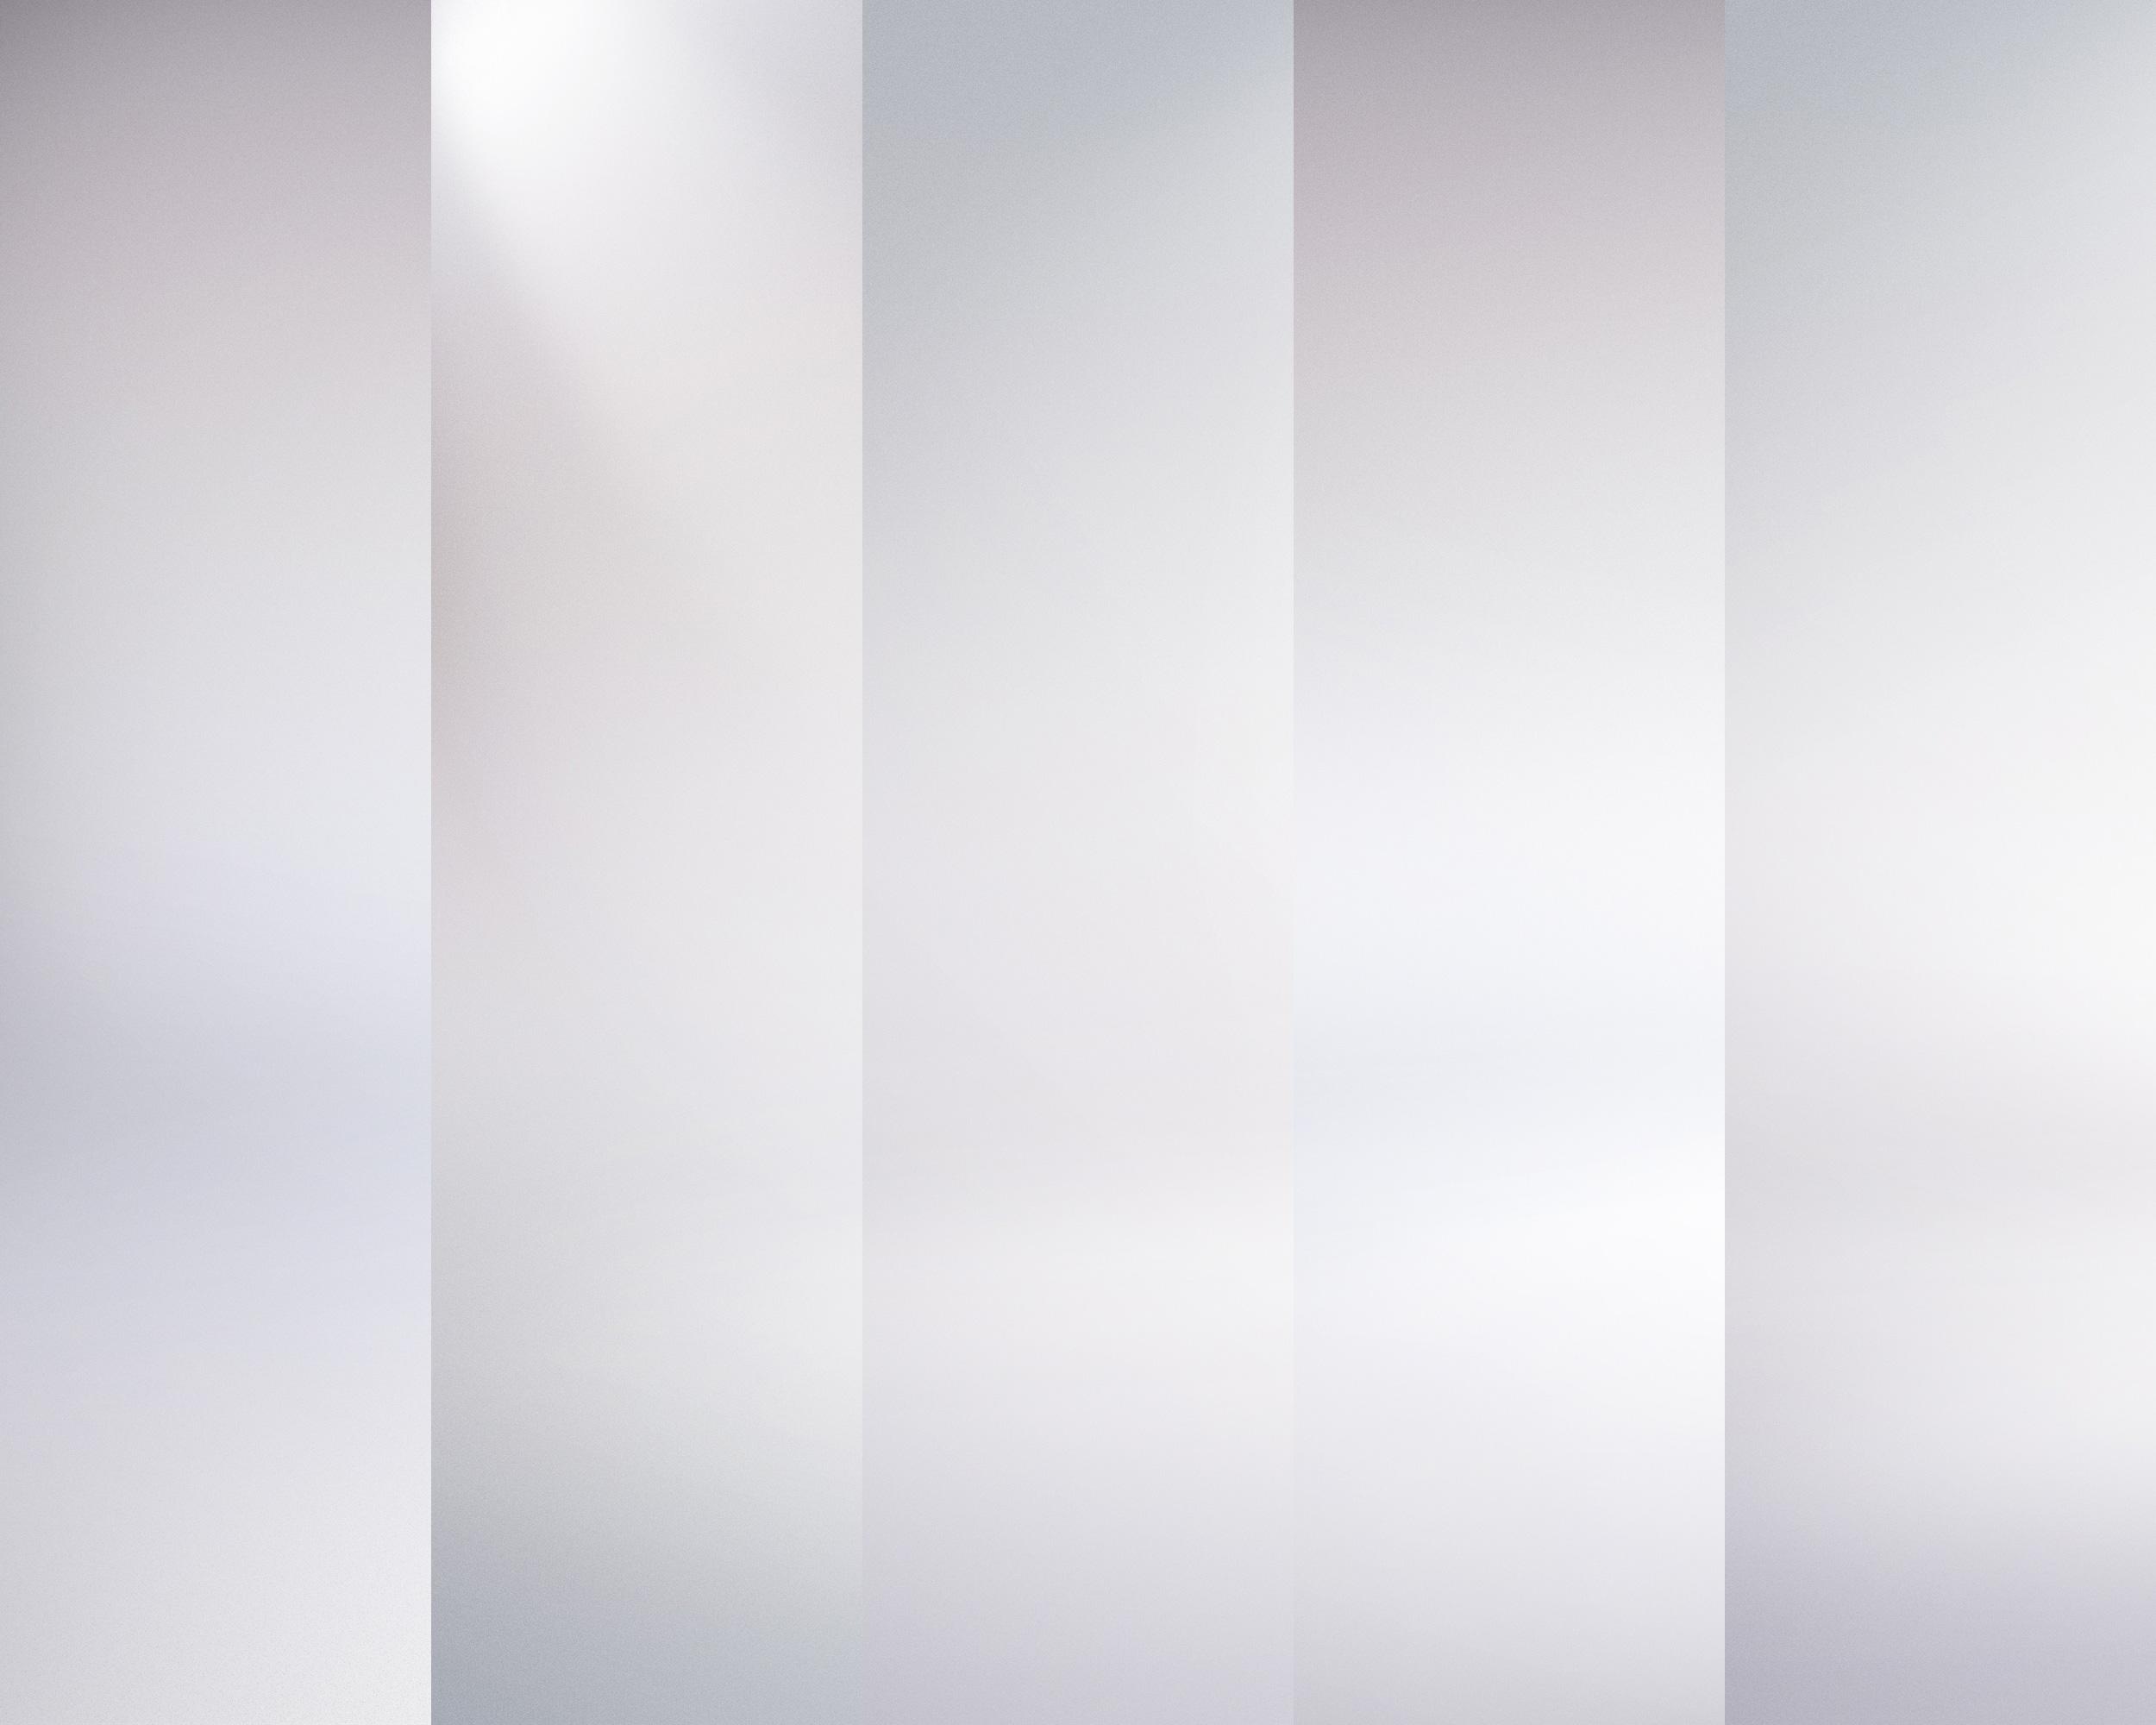 Light Grey Paint 5 Infinite White Studio Backdrops Graphicburger